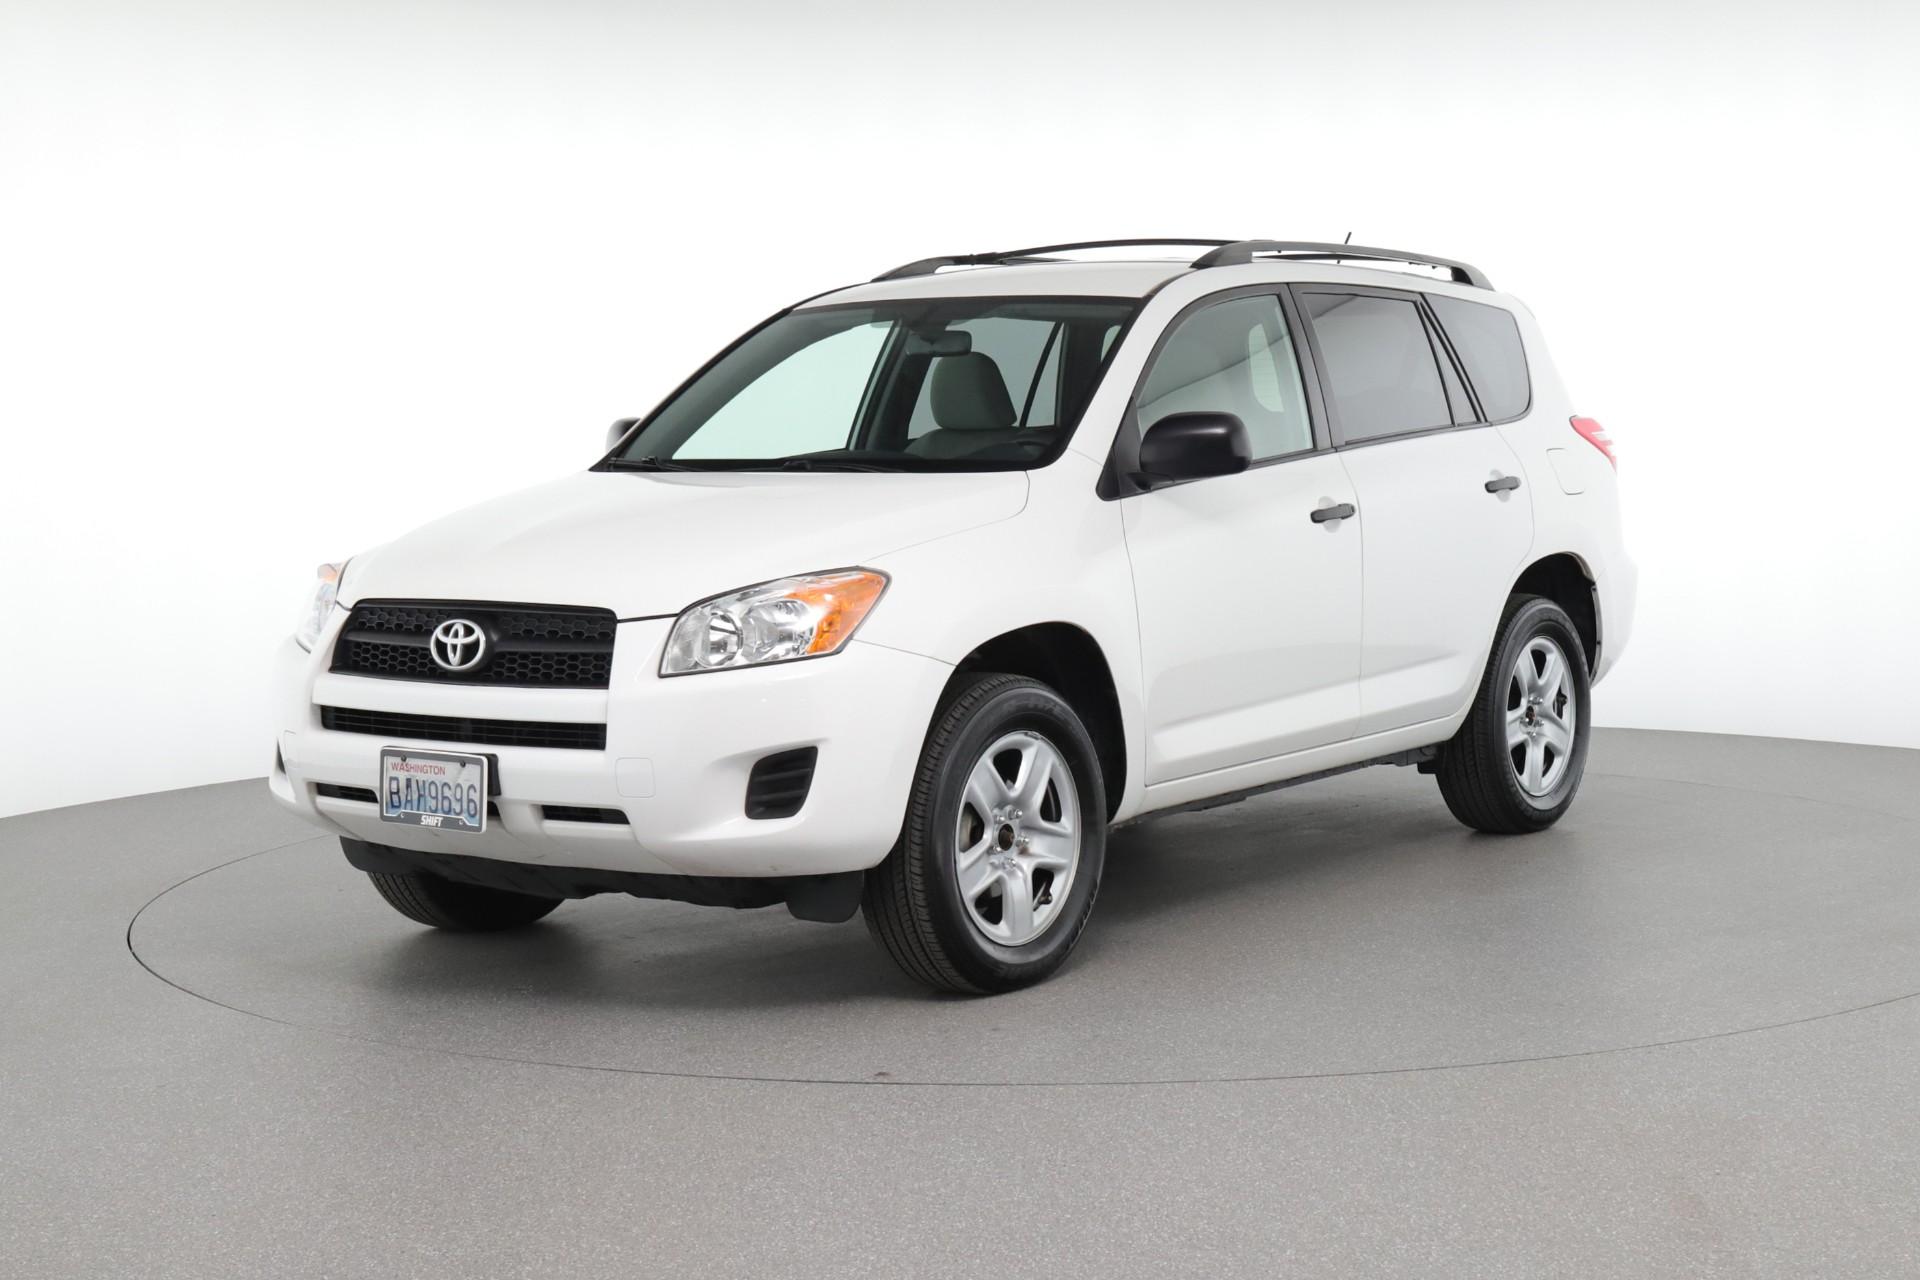 2010 Toyota RAV4 (from $10,950)